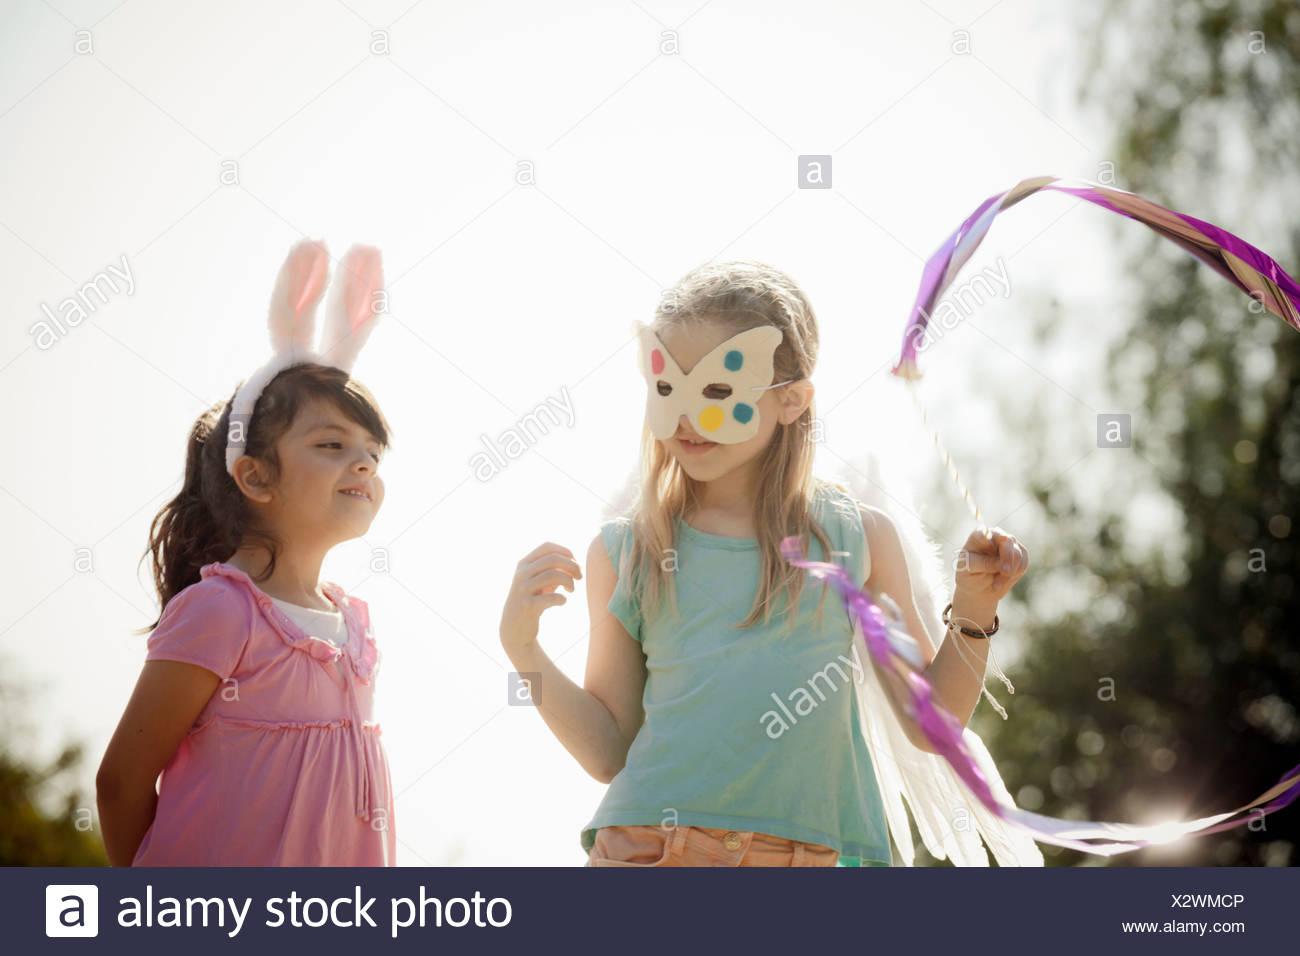 Kinder in Kostümen spielen handeln Stockbild